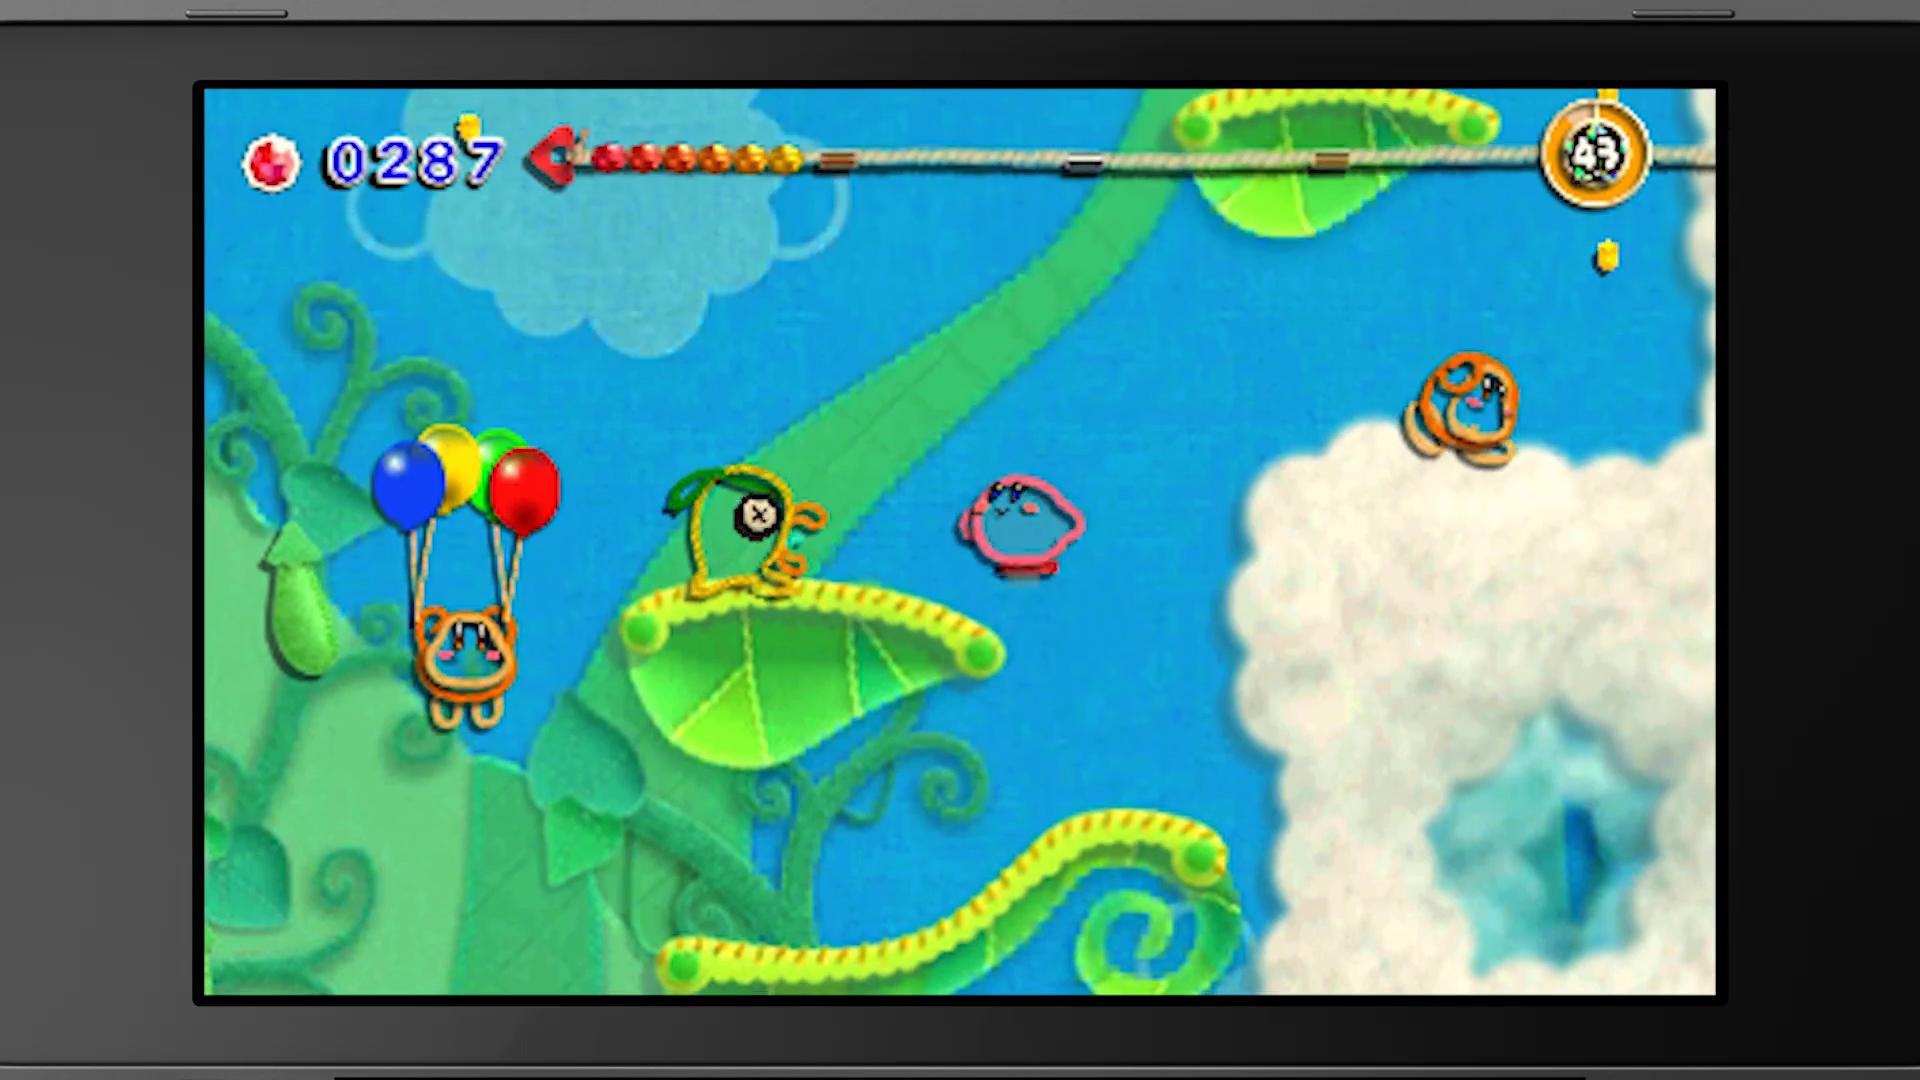 Kirby's Extra Epic Yarn - Kirby jumping